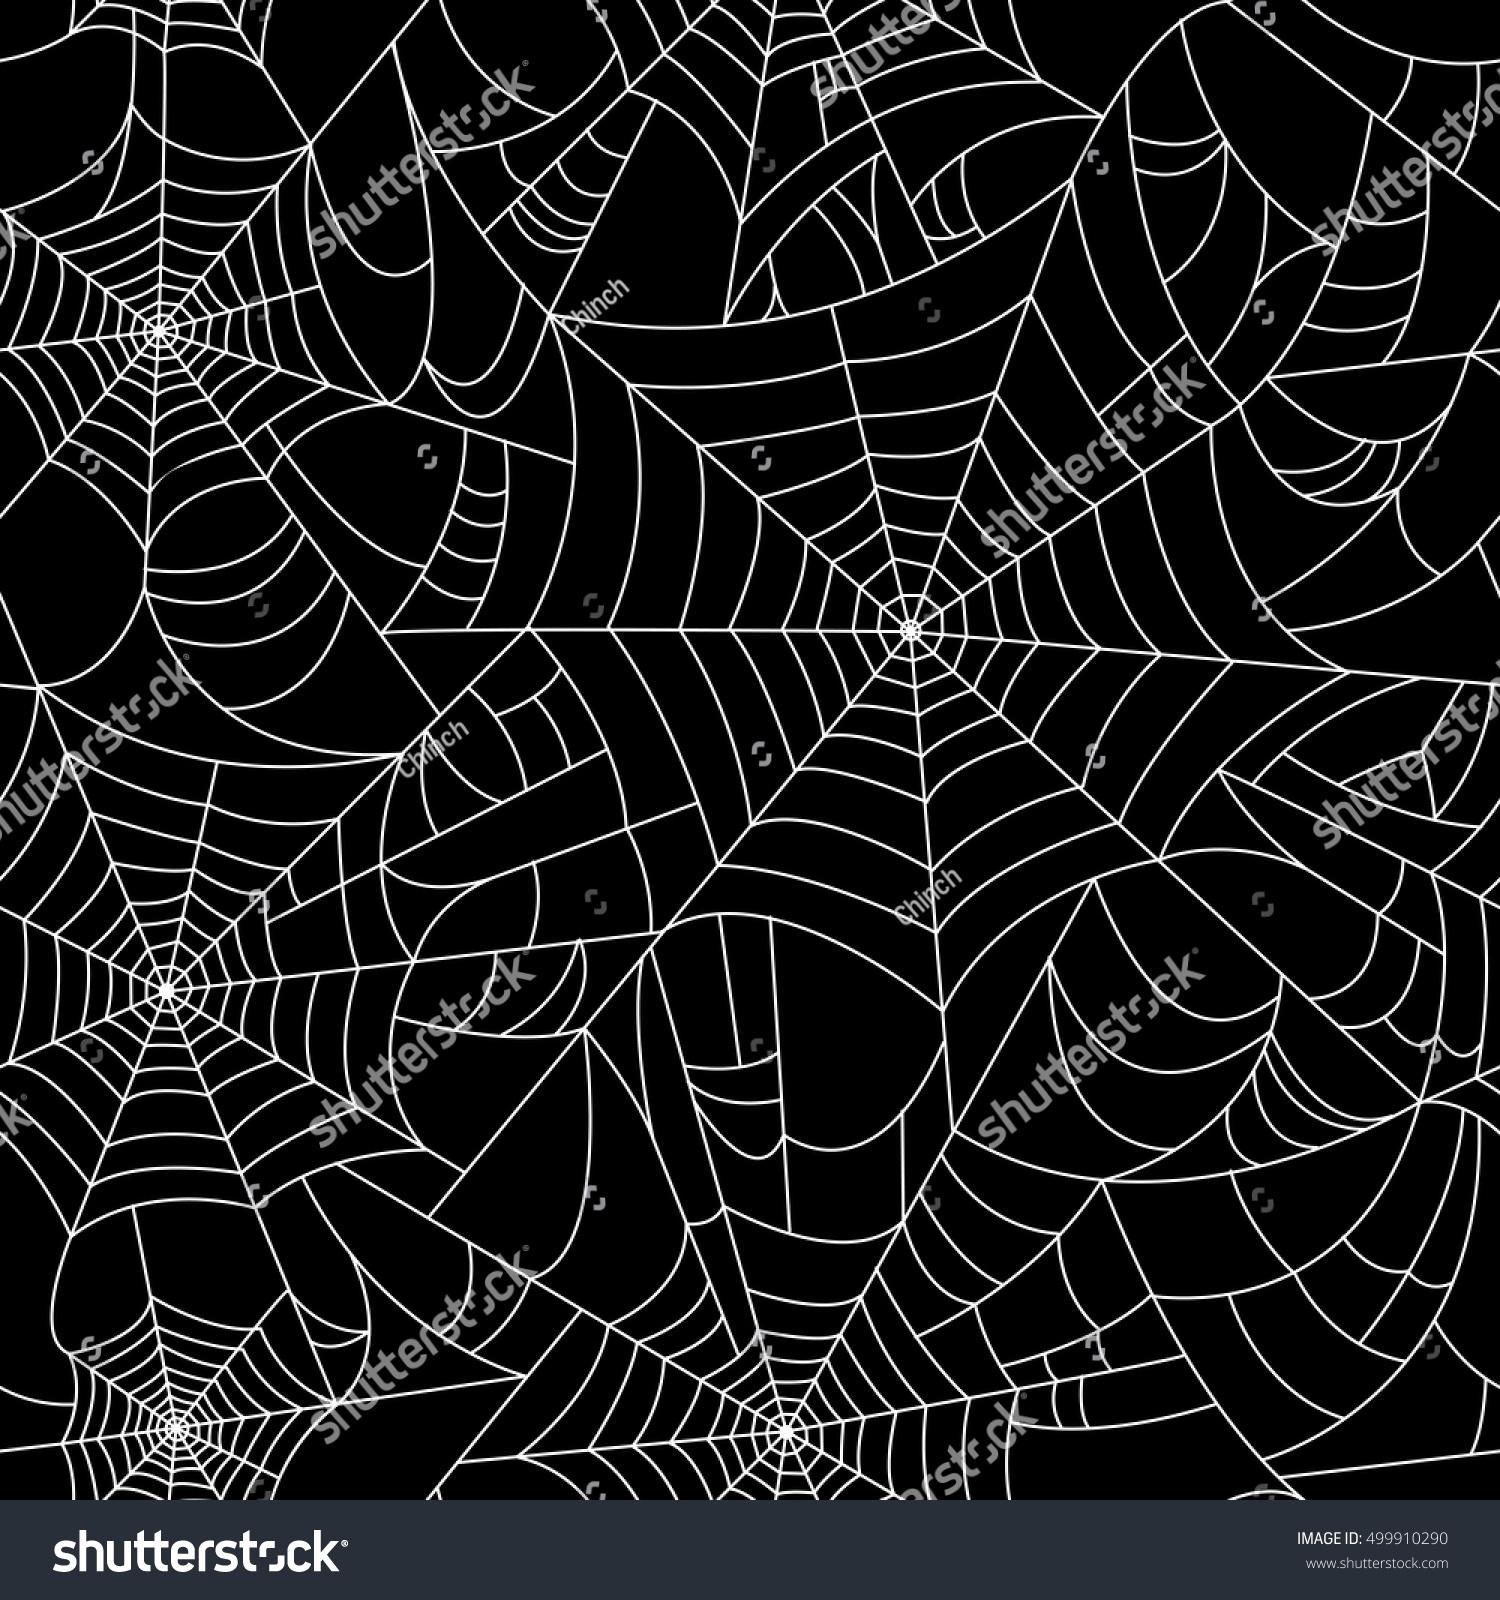 halloween spider web seamless pattern black stock vector (royalty